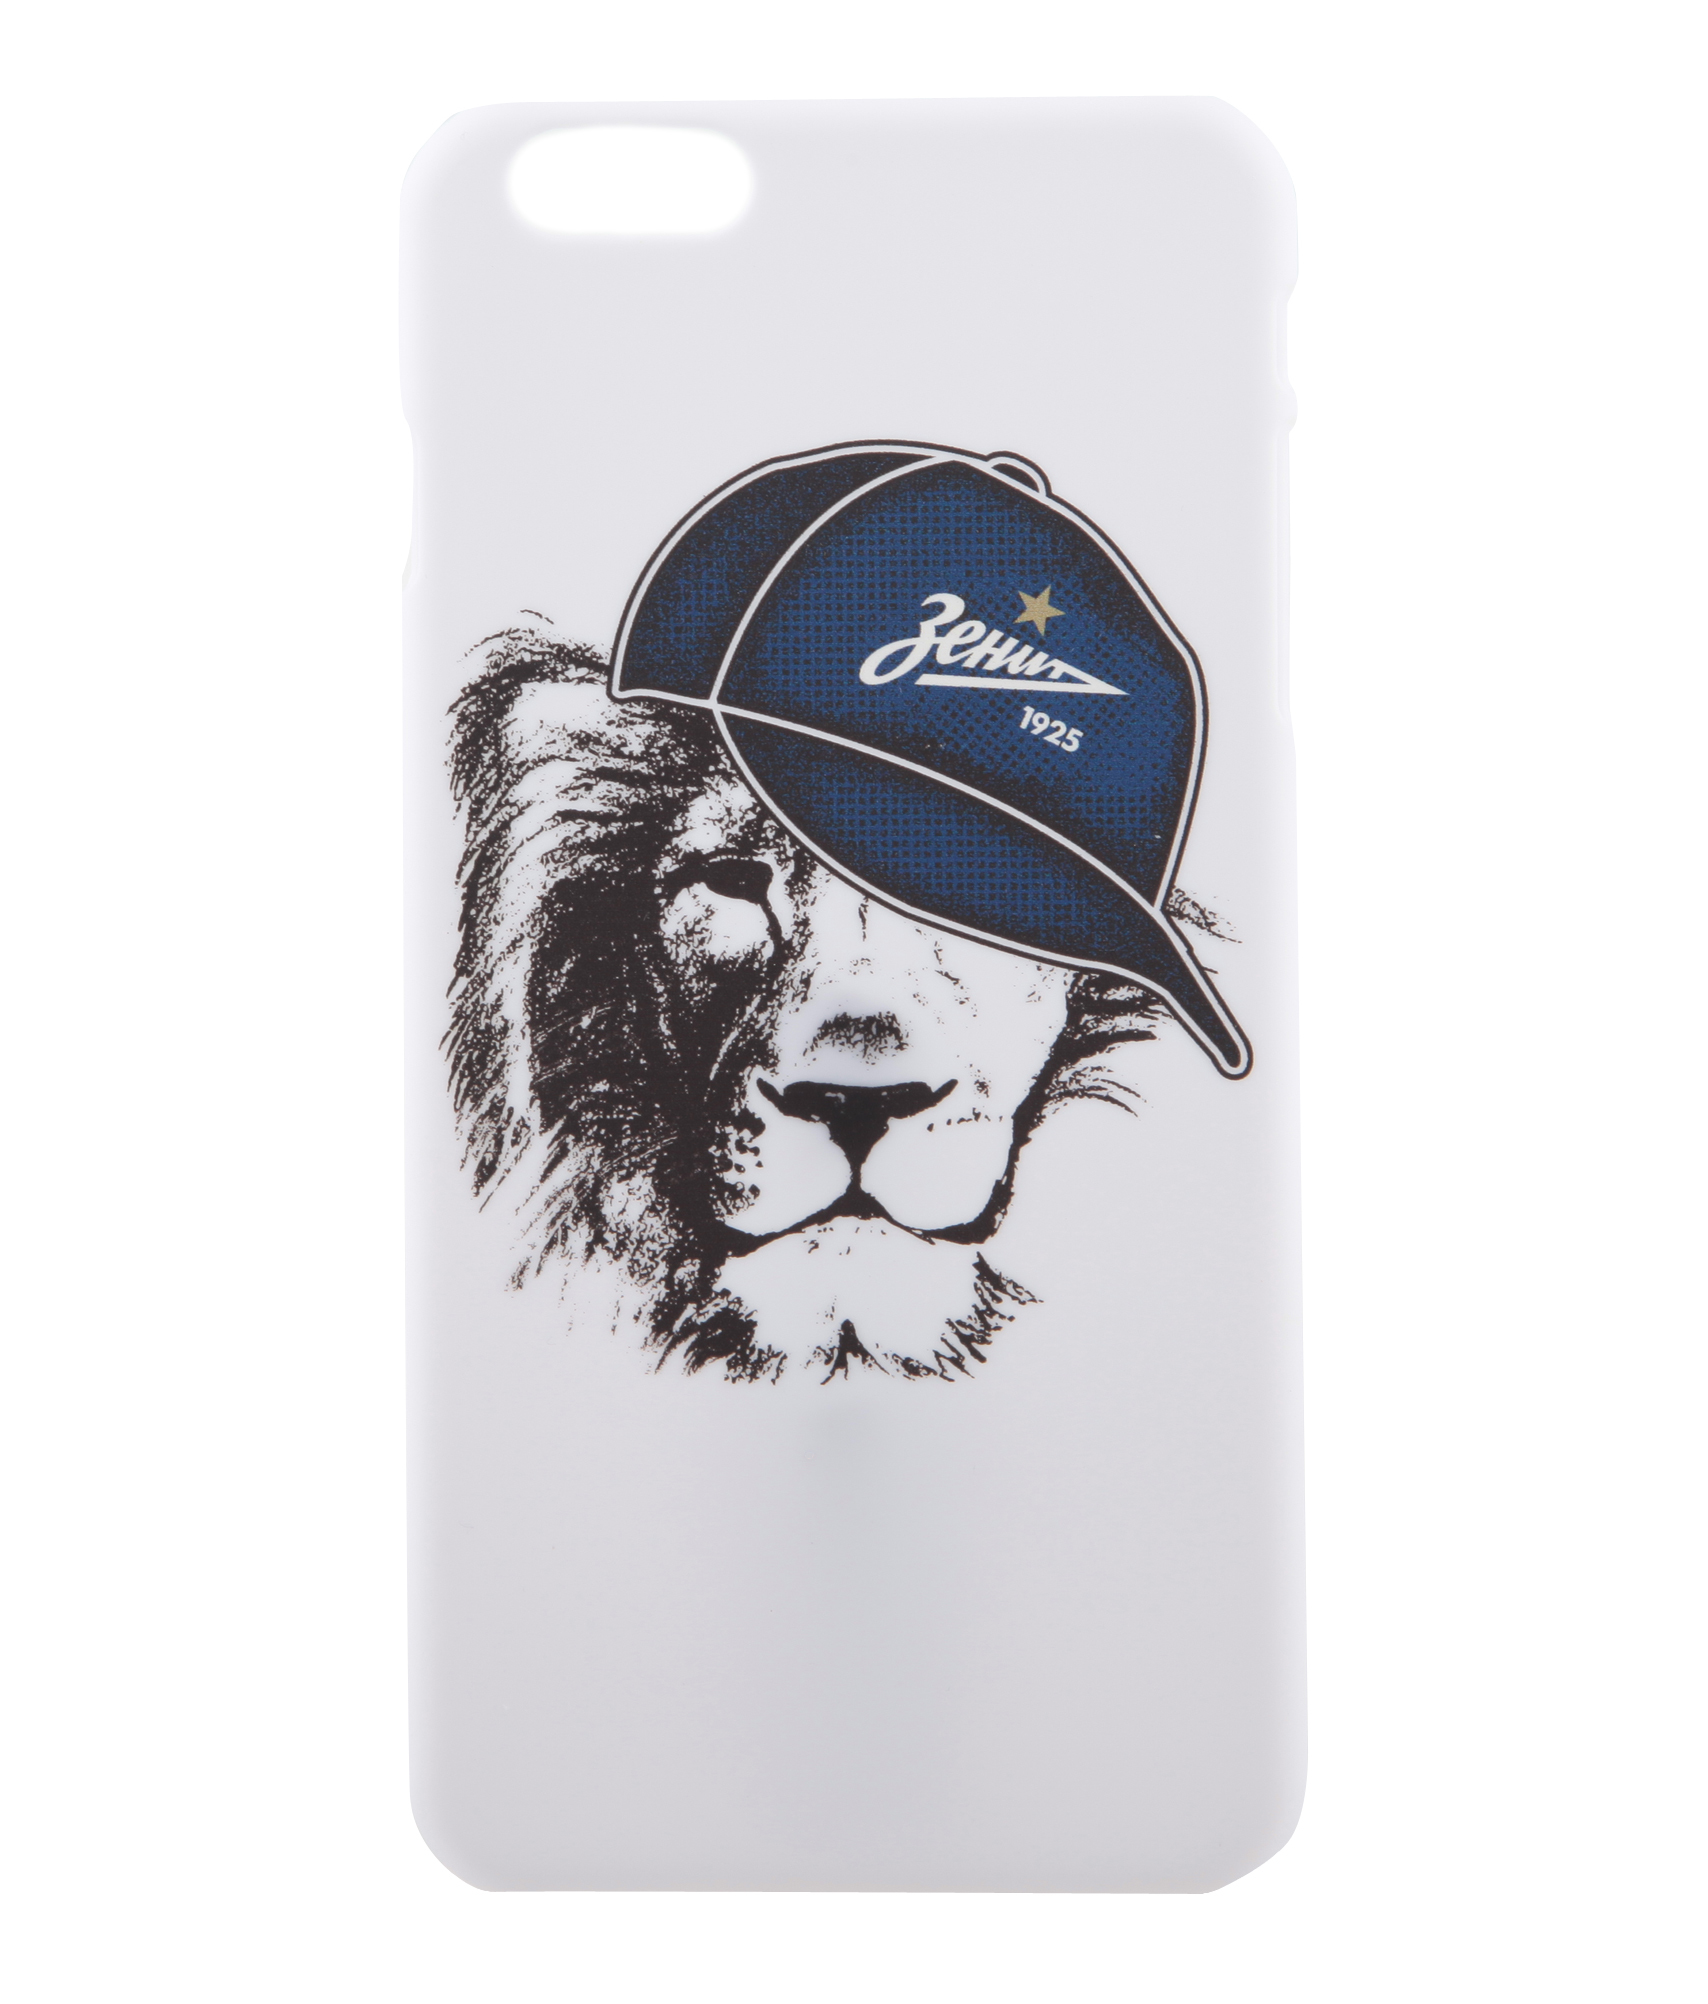 Фото - Чехол для IPhone 6/6S Plus «Кепка» Зенит чехол накладка для apple iphone 6 6s deppa gel plus case 85213 pink клип кейс полиуретан